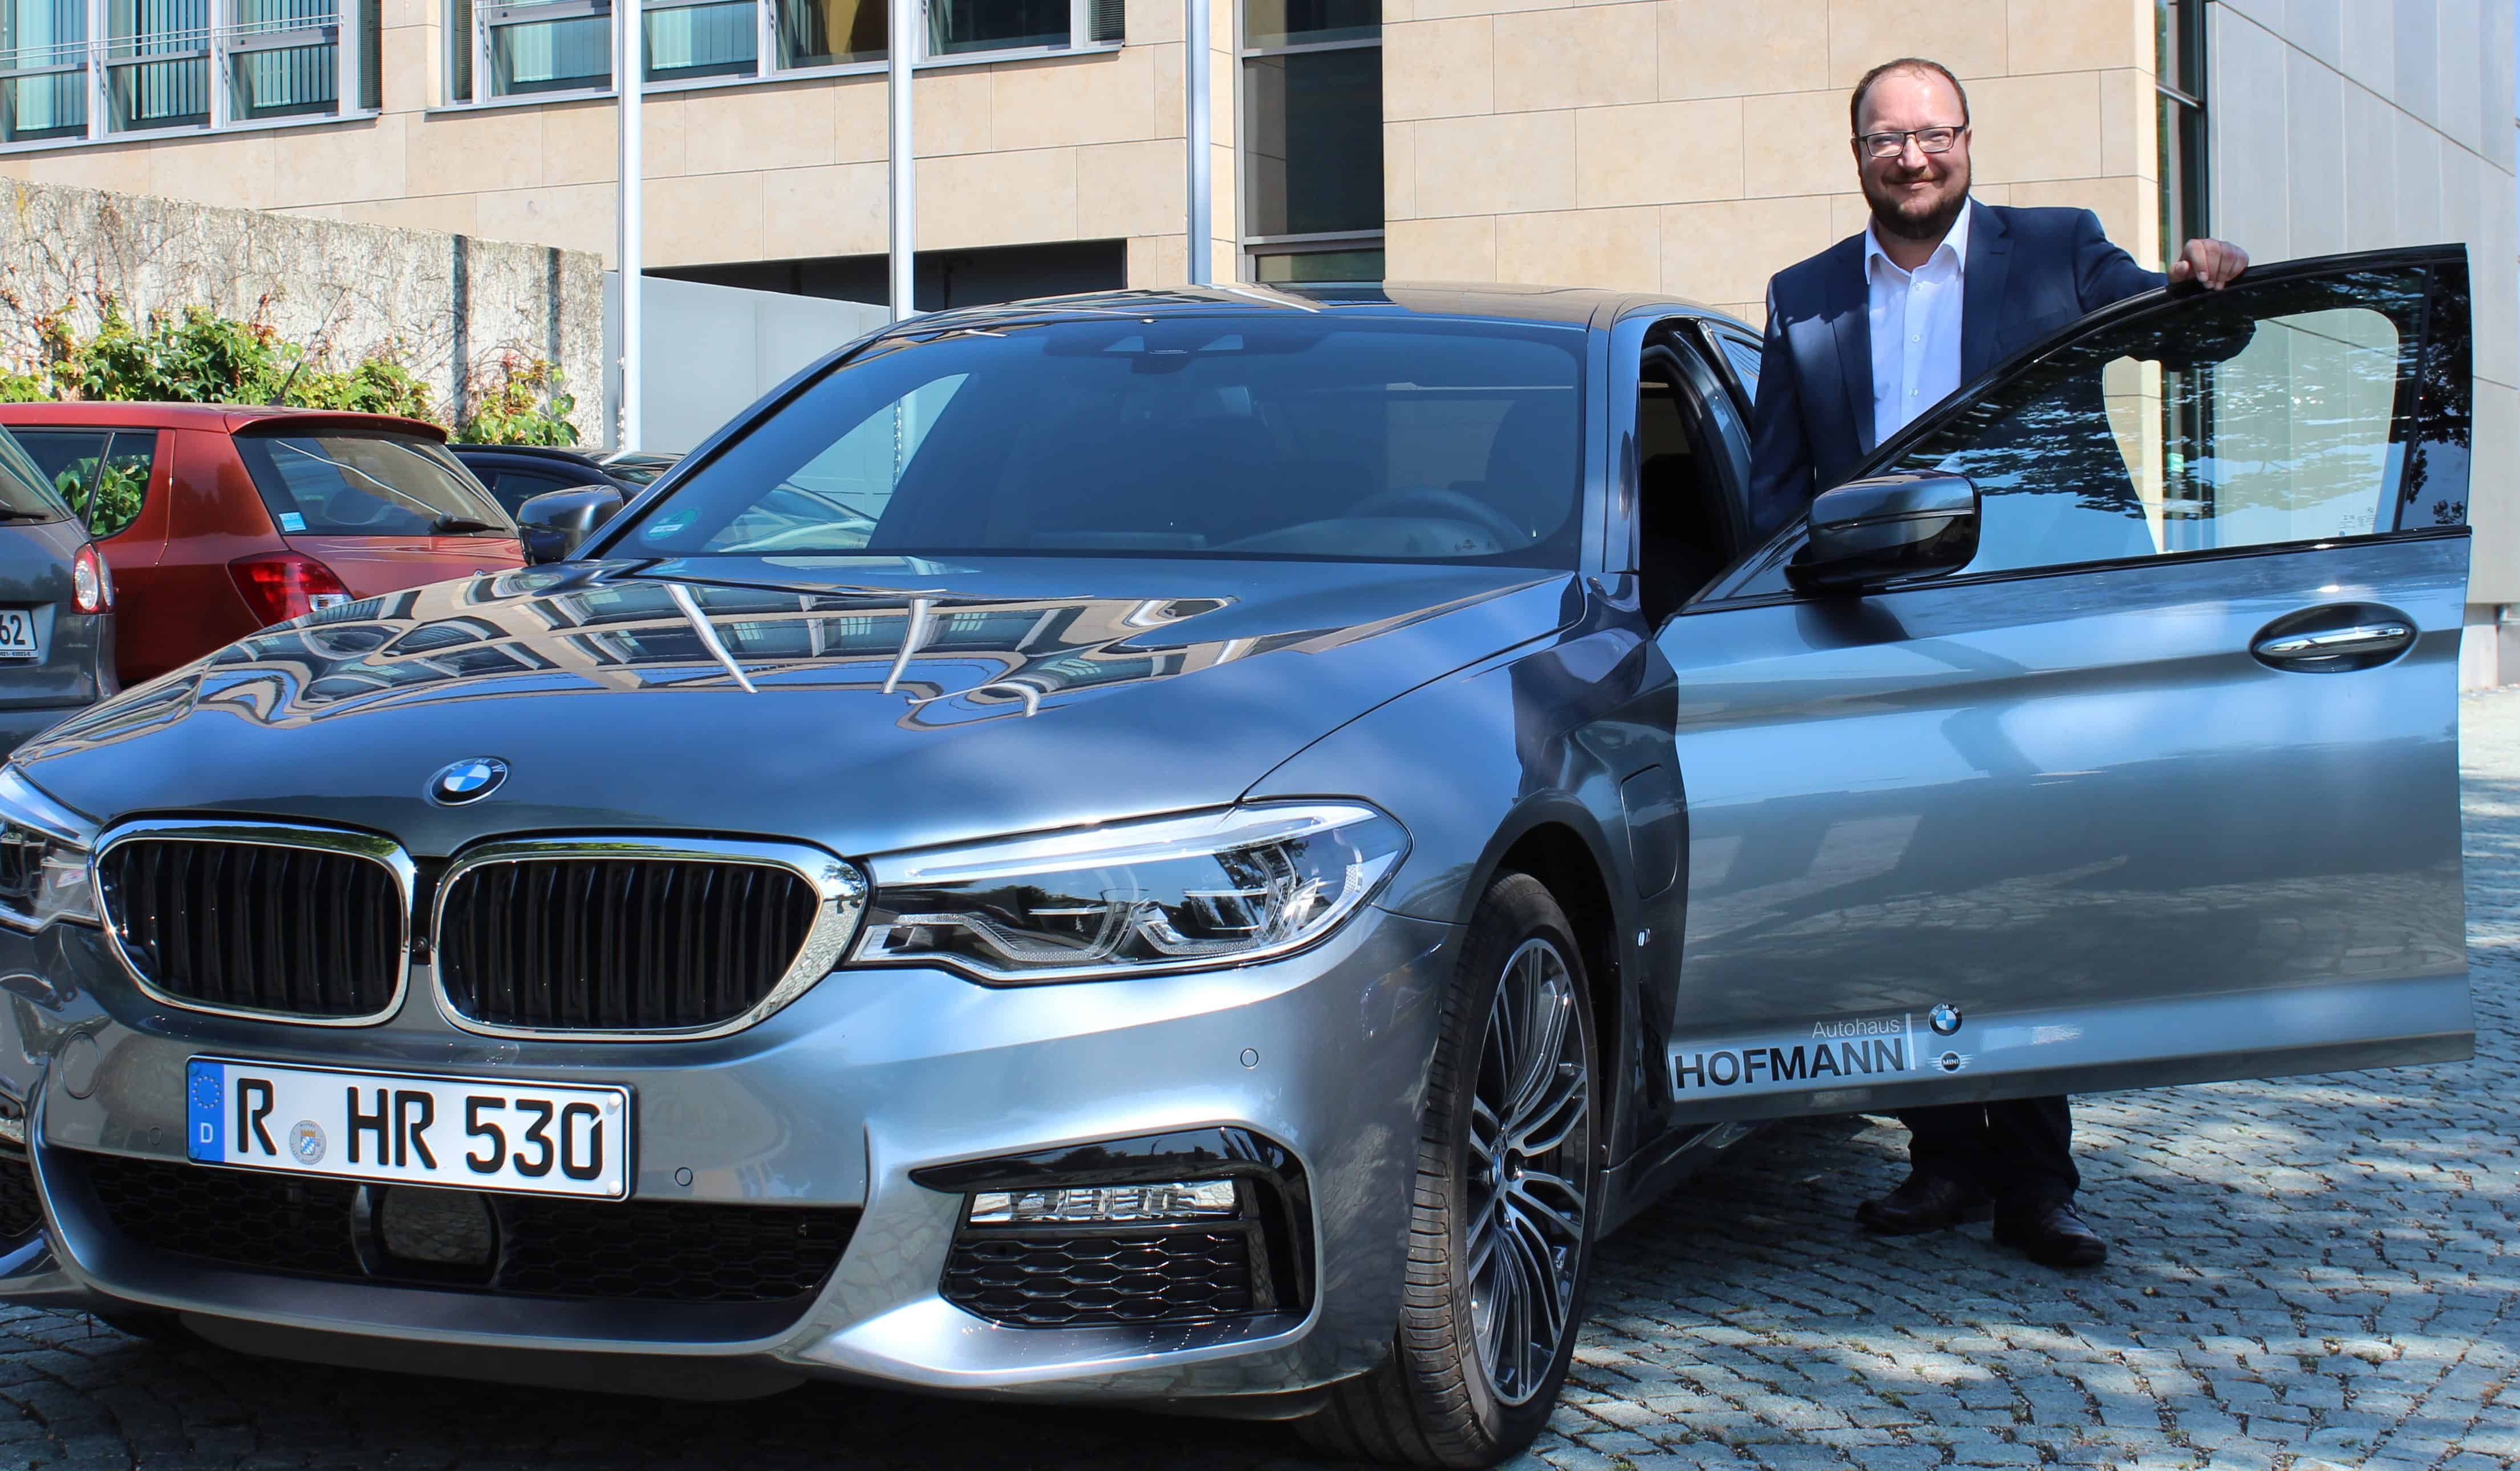 Blizz testet den neuen BMW 530e iPerformance aus dem Autohaus Hofmann